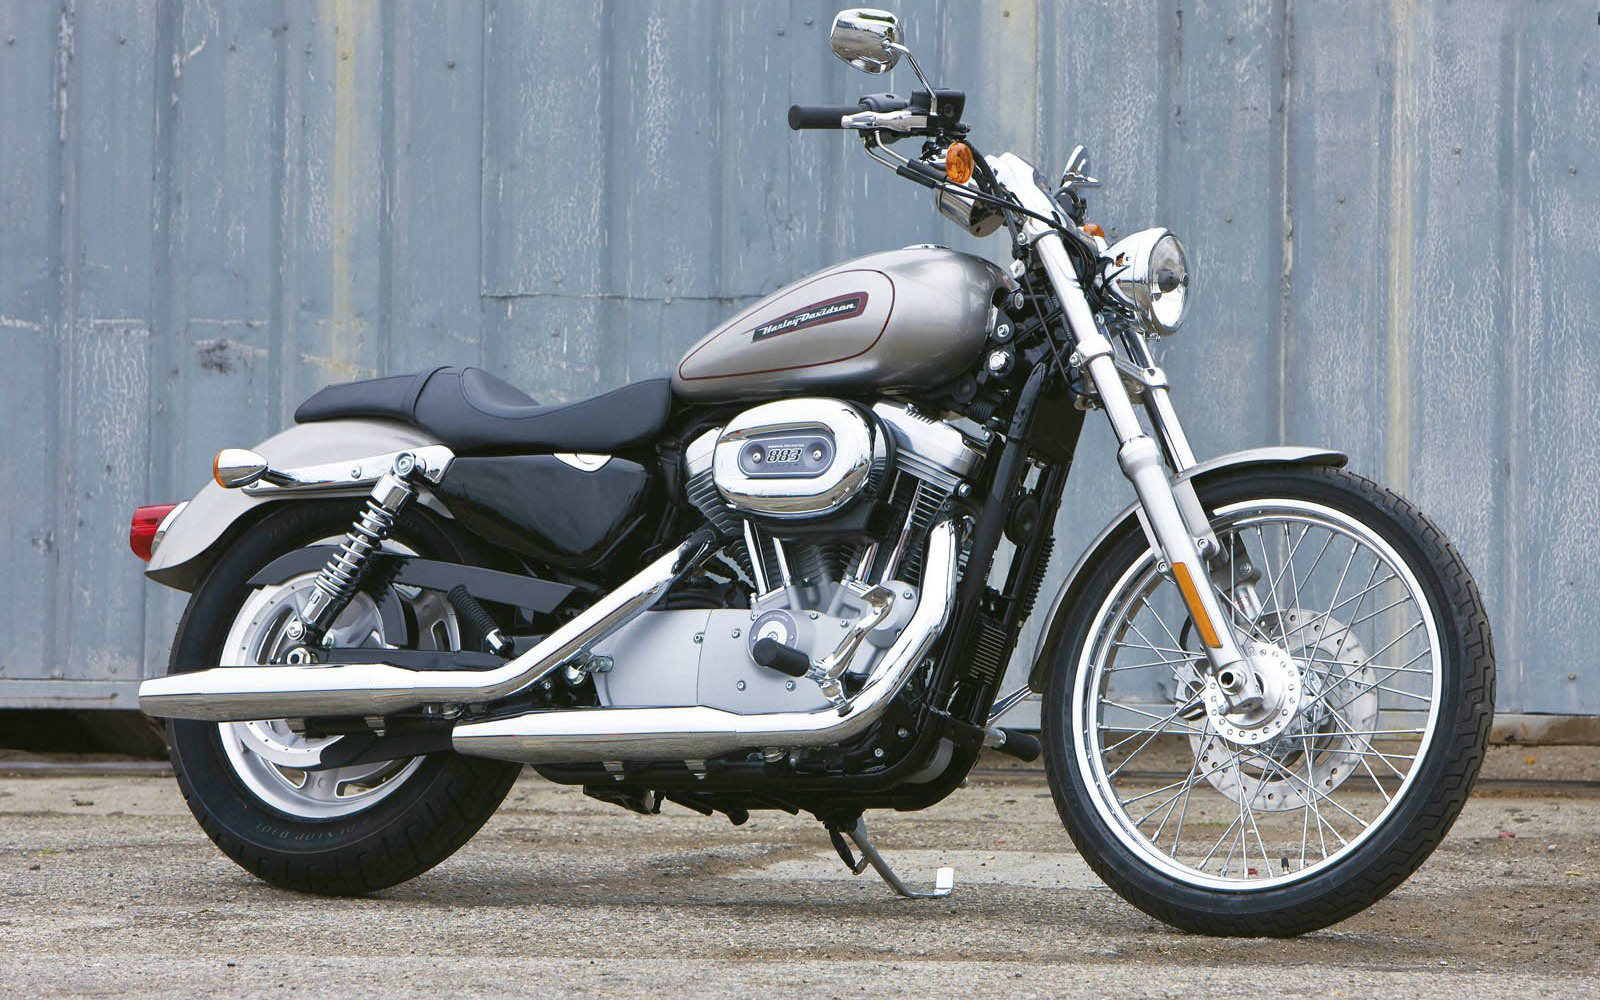 Harley Davidson Sportster Bike Hd Wallpaper 1600x1000